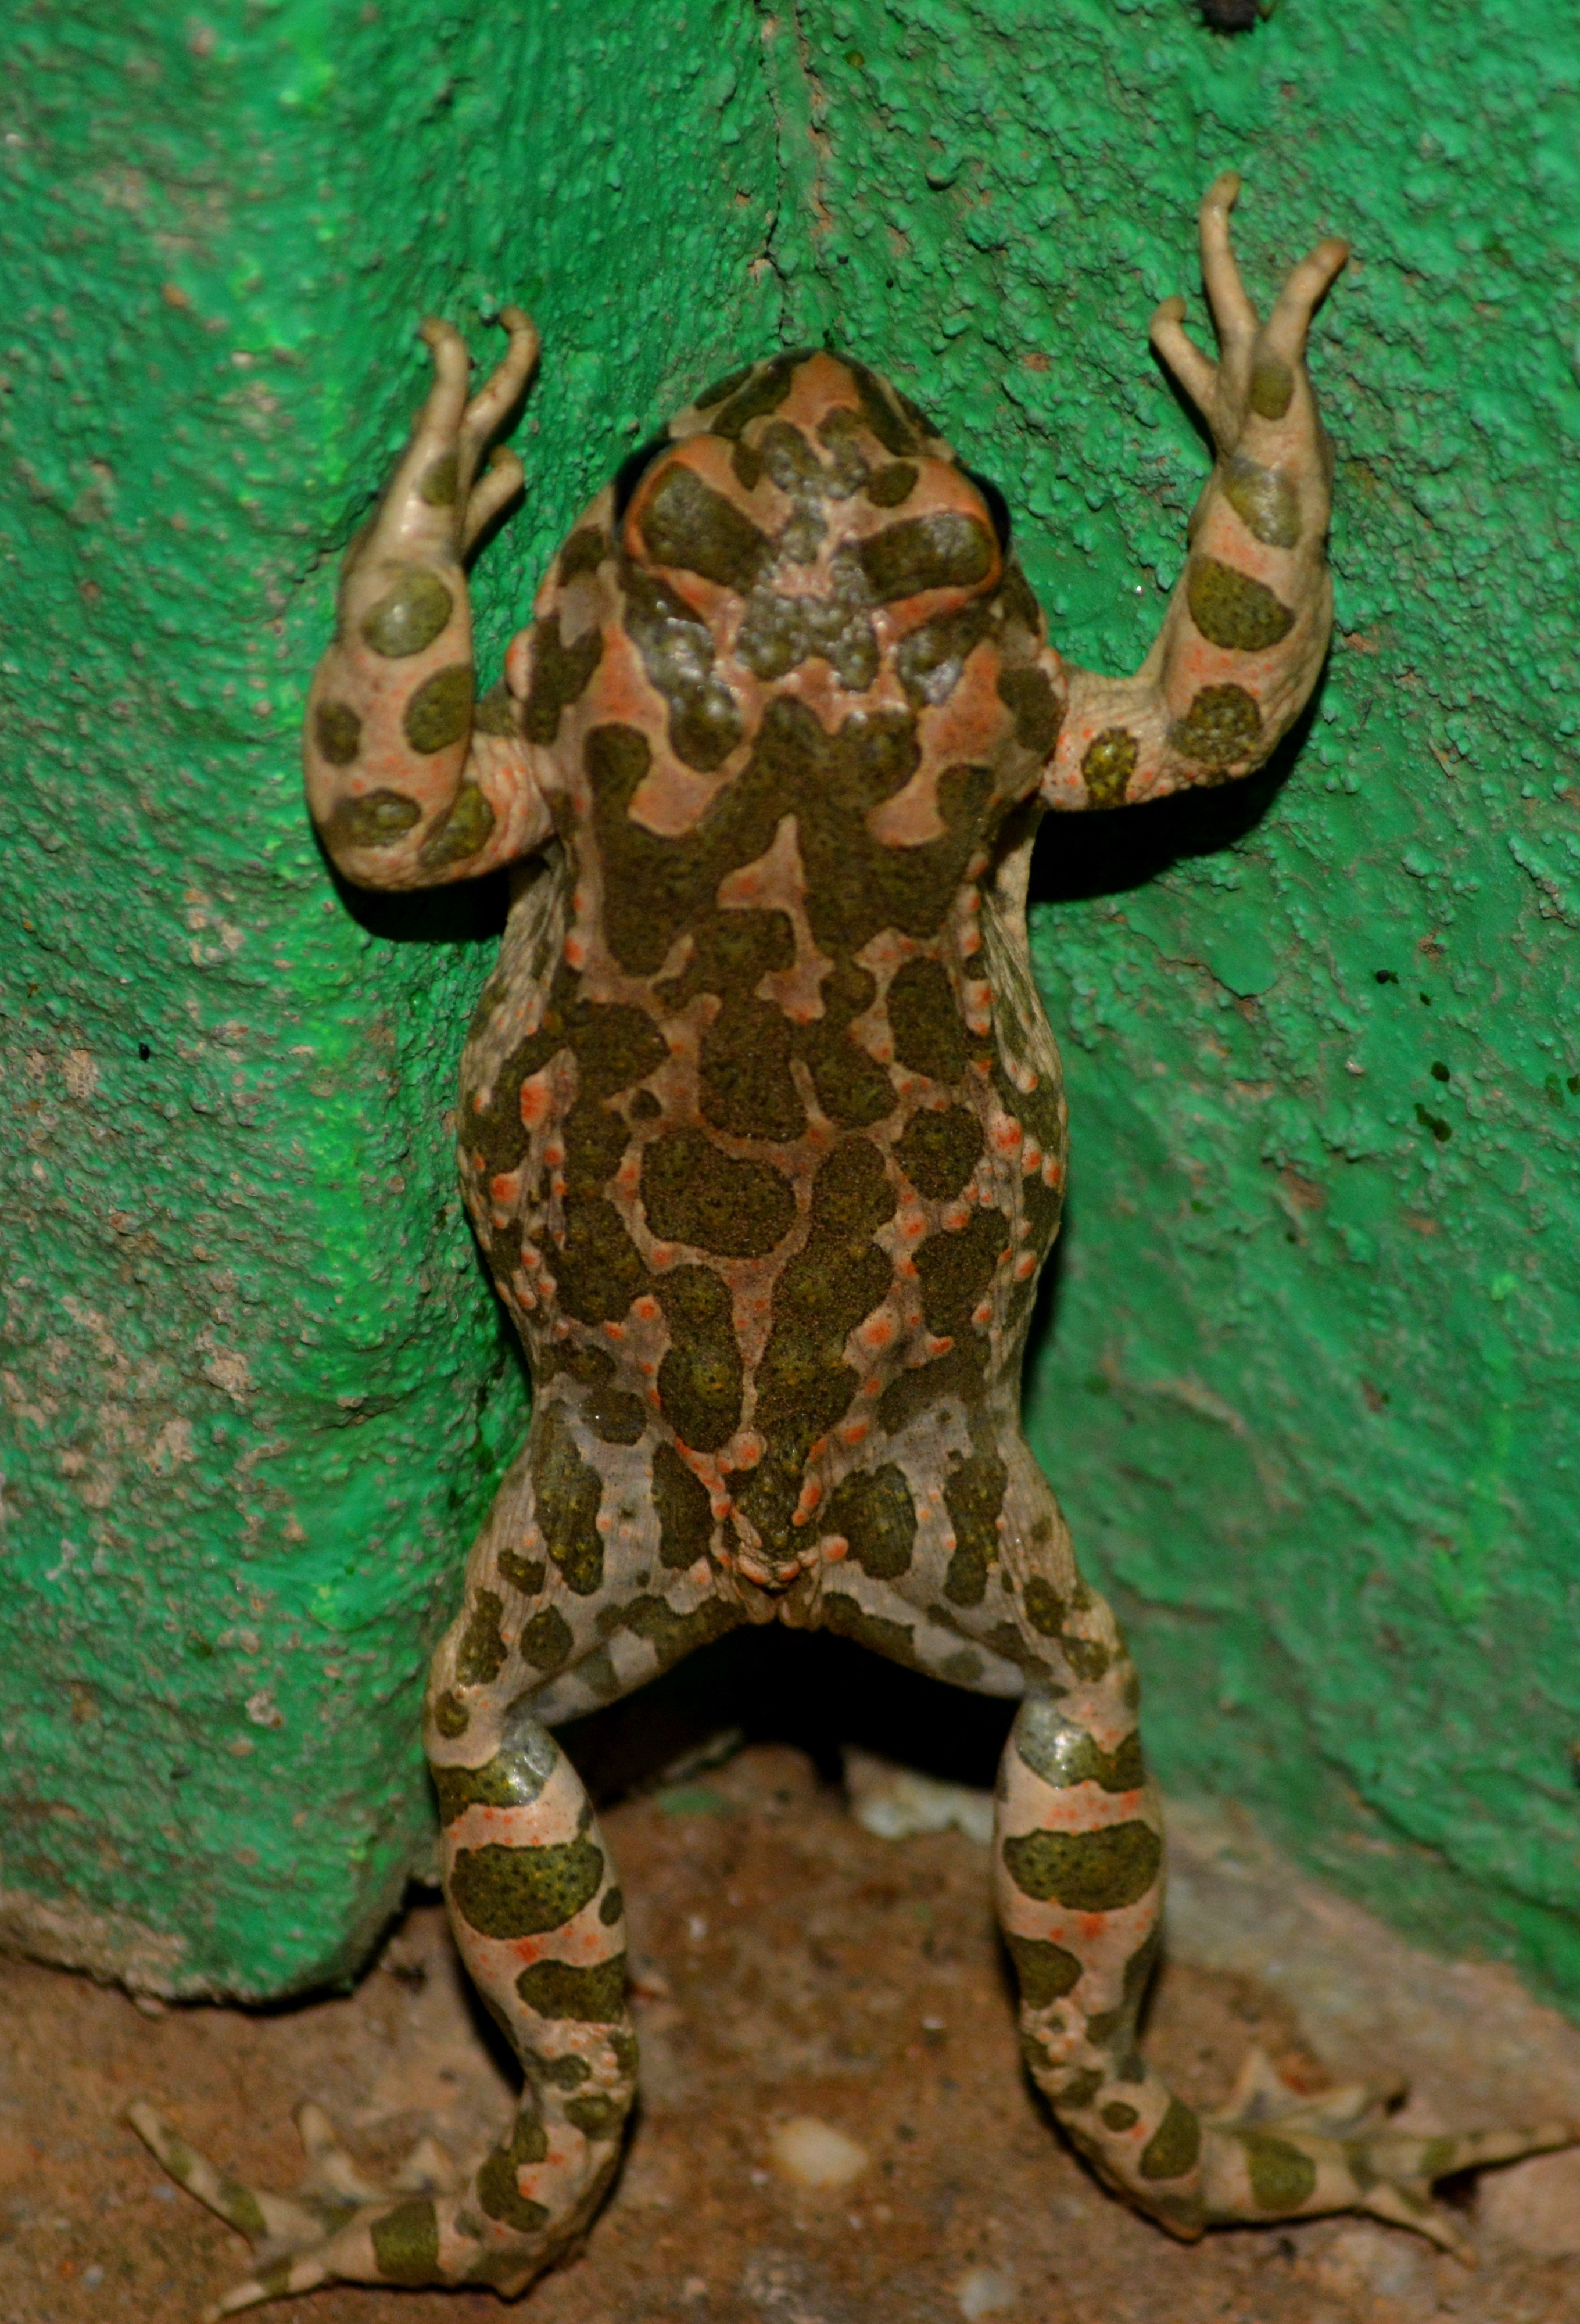 Frog, Animal, Green, Small, Wild, HQ Photo